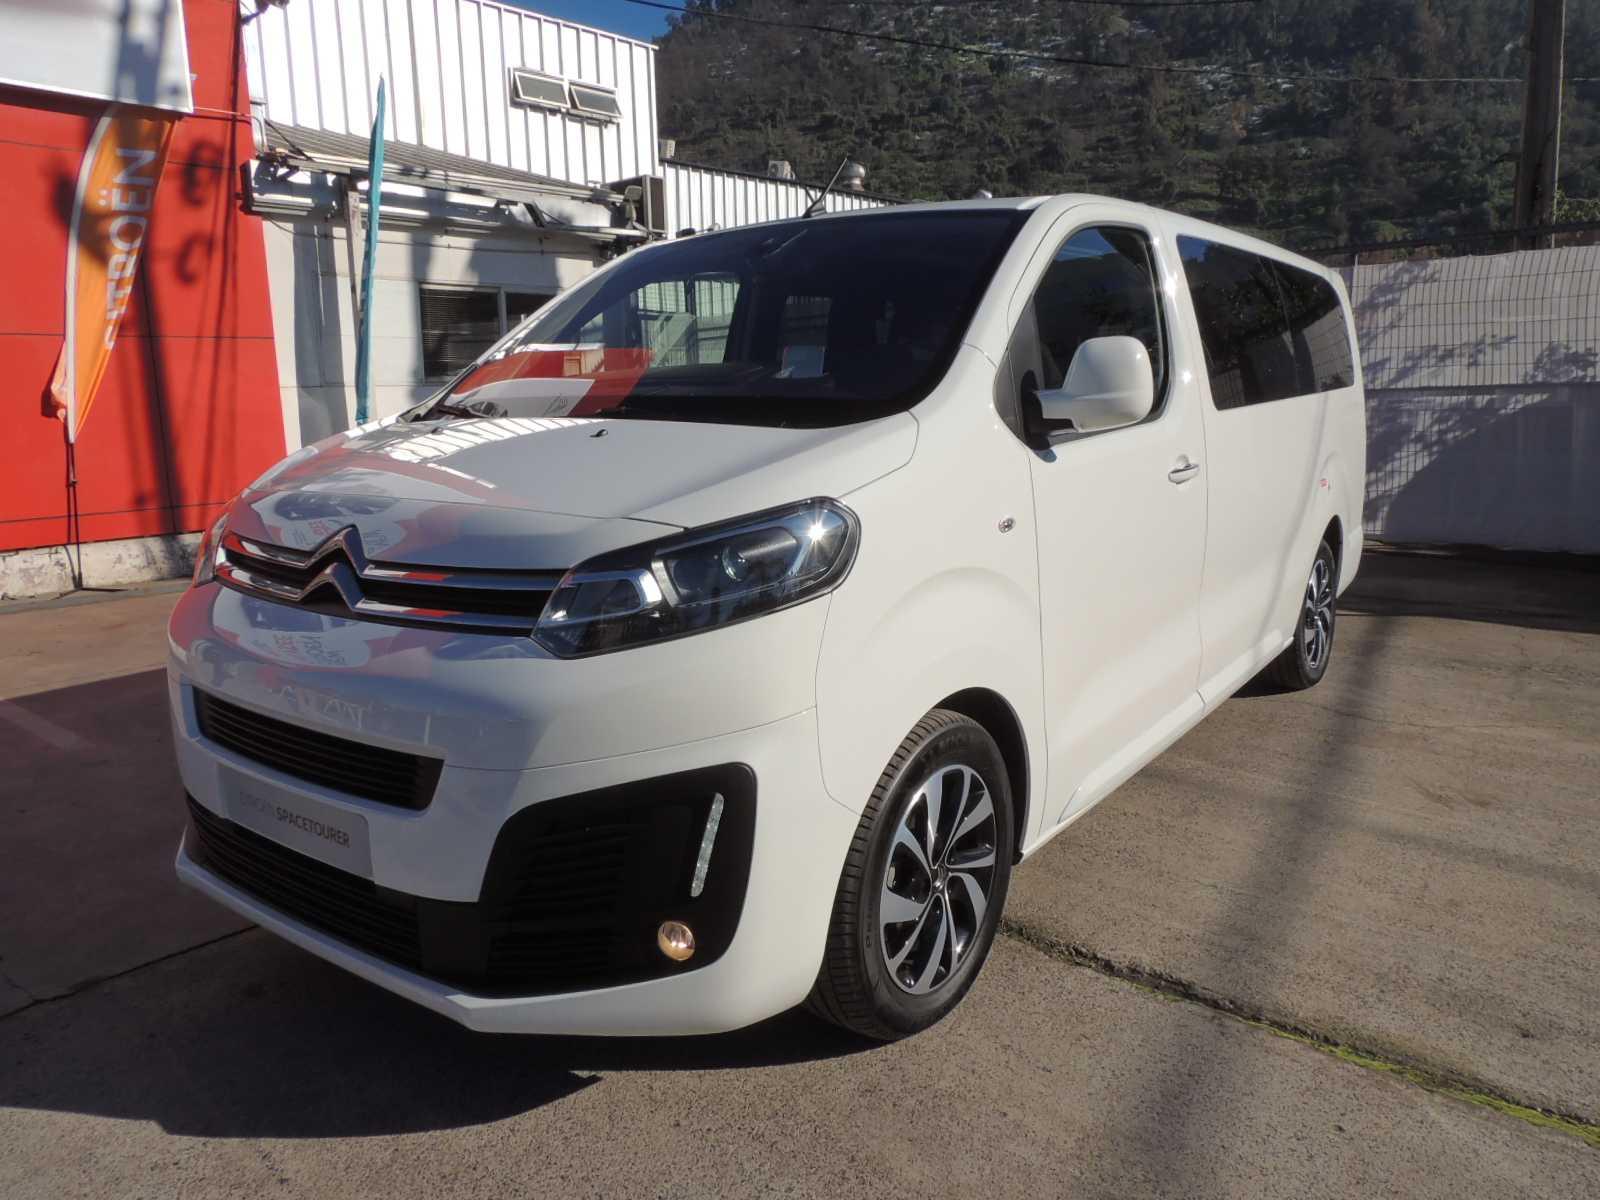 Citroën presentó en Chile su nuevo monovolumen Spacetourer